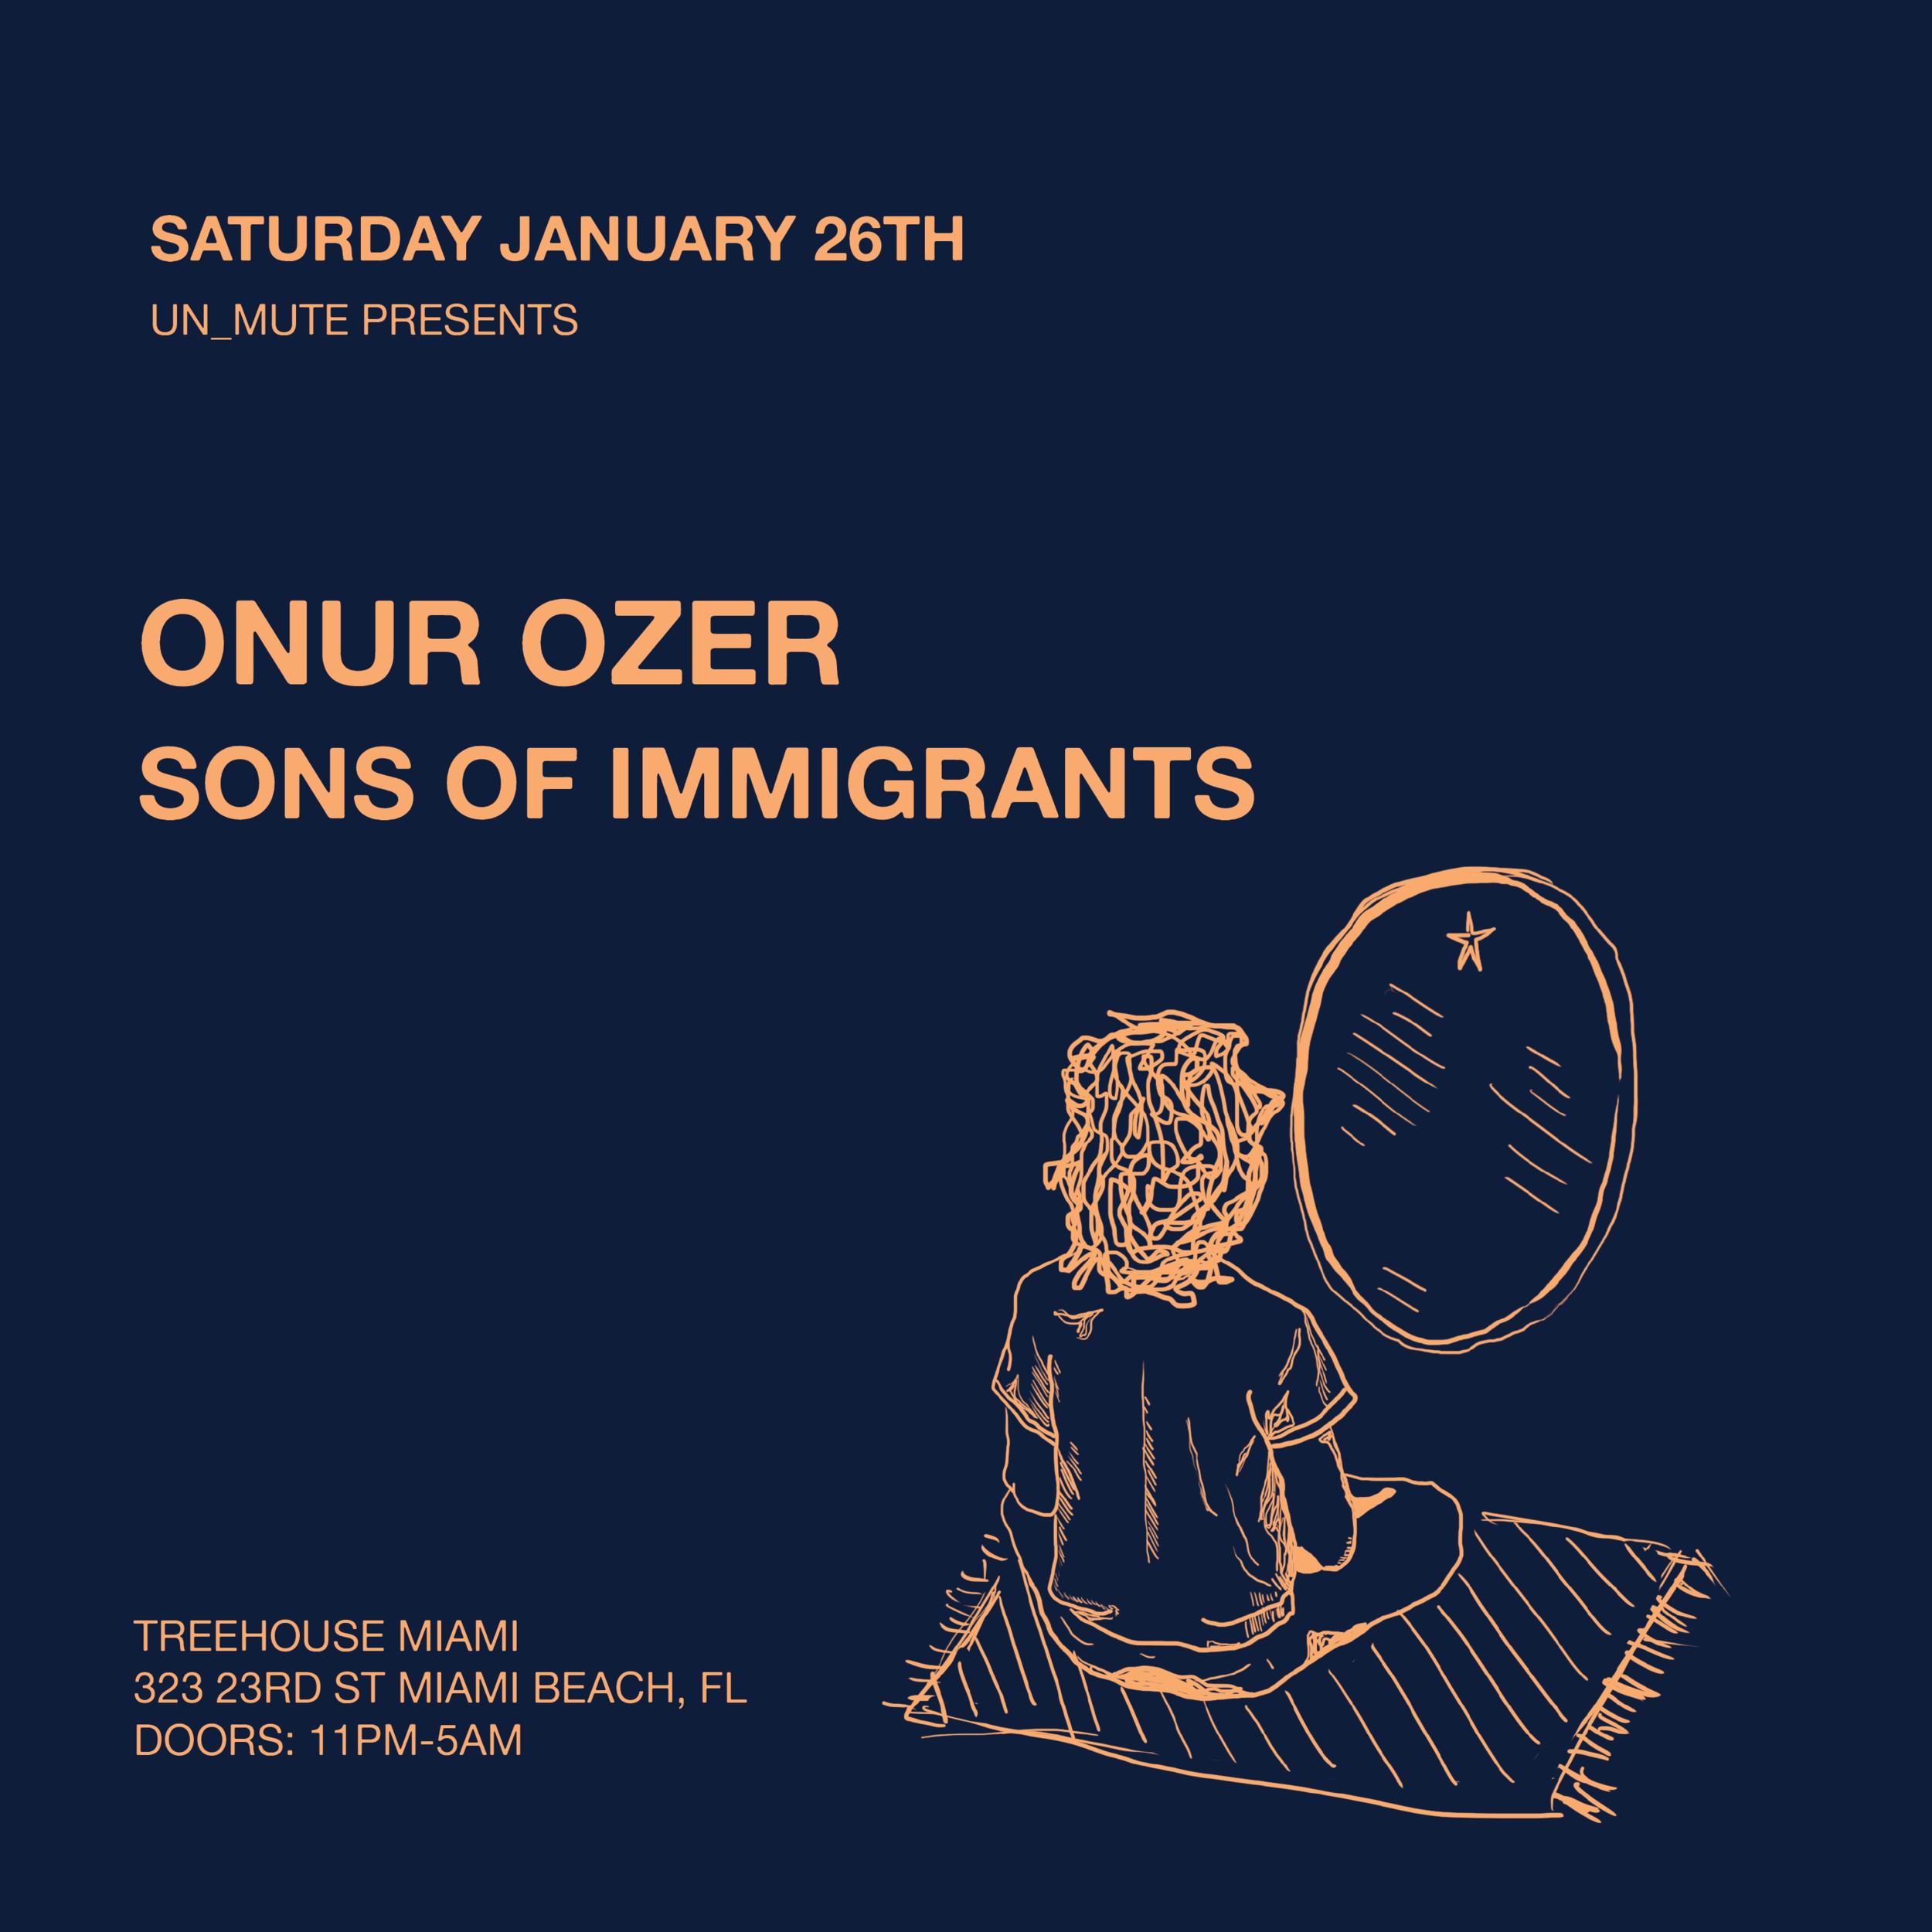 Onur_Ozer-01.png